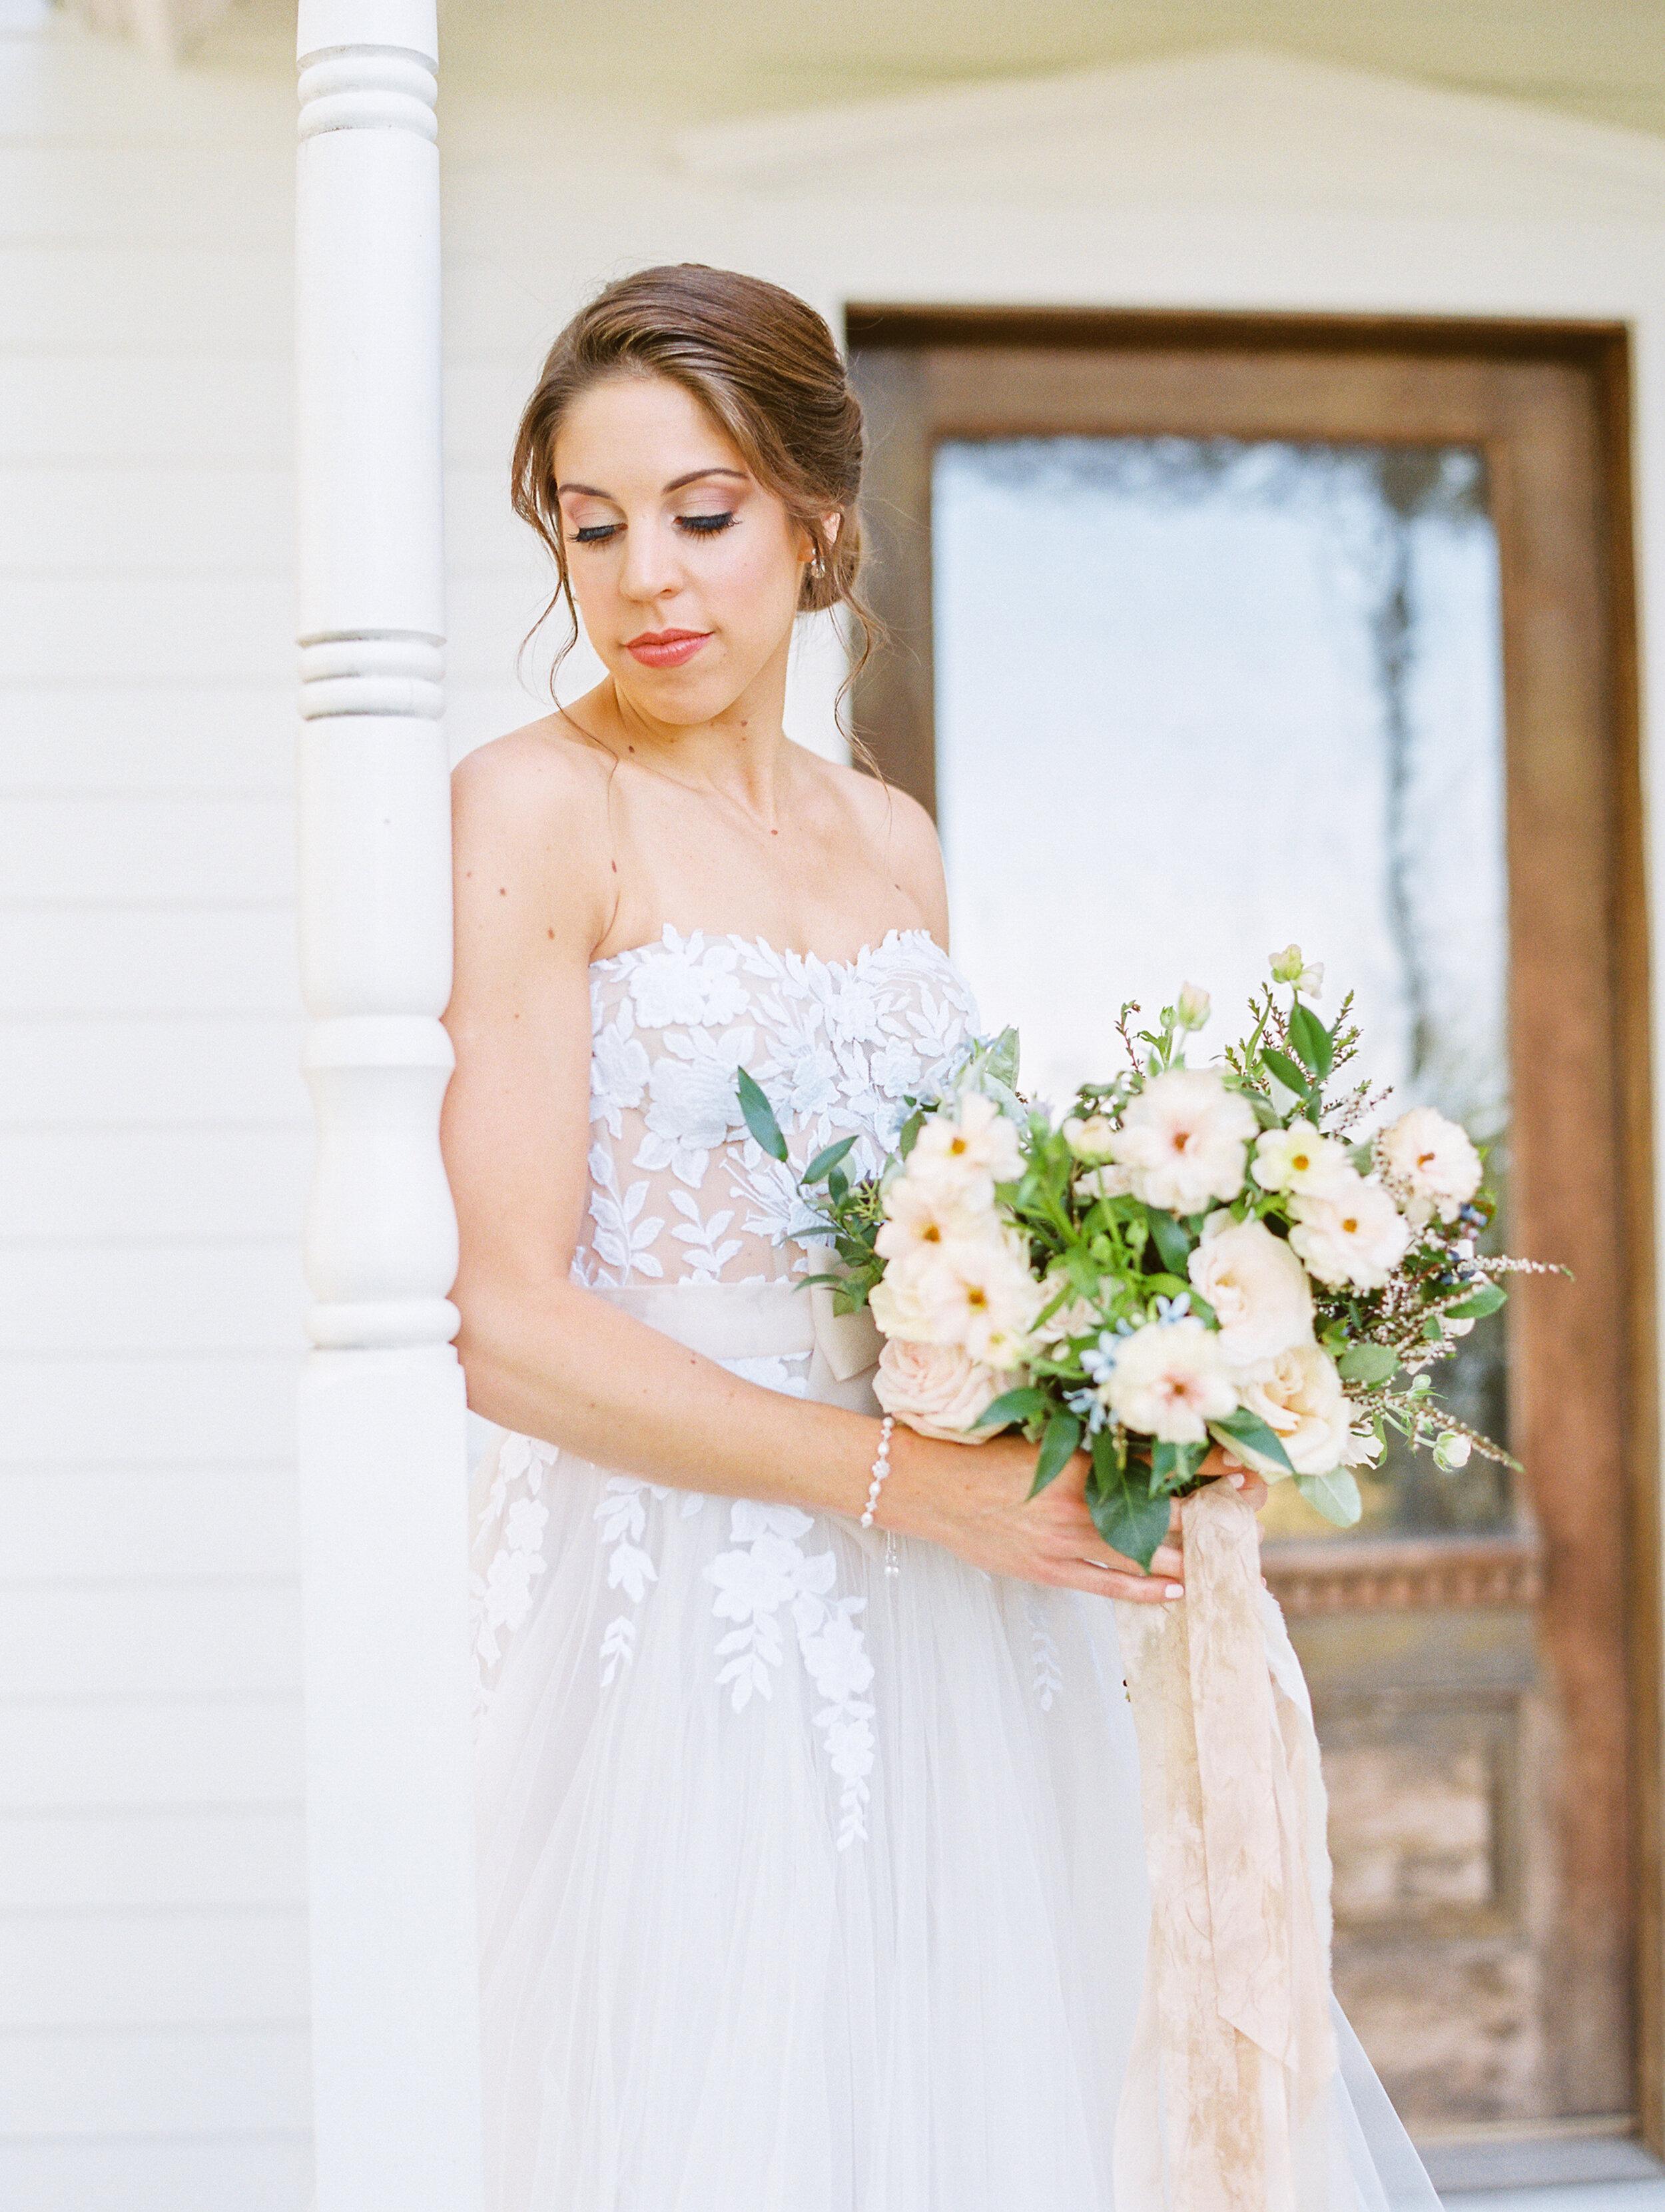 Steinlage+Wedding+Getting+Ready-86.jpg